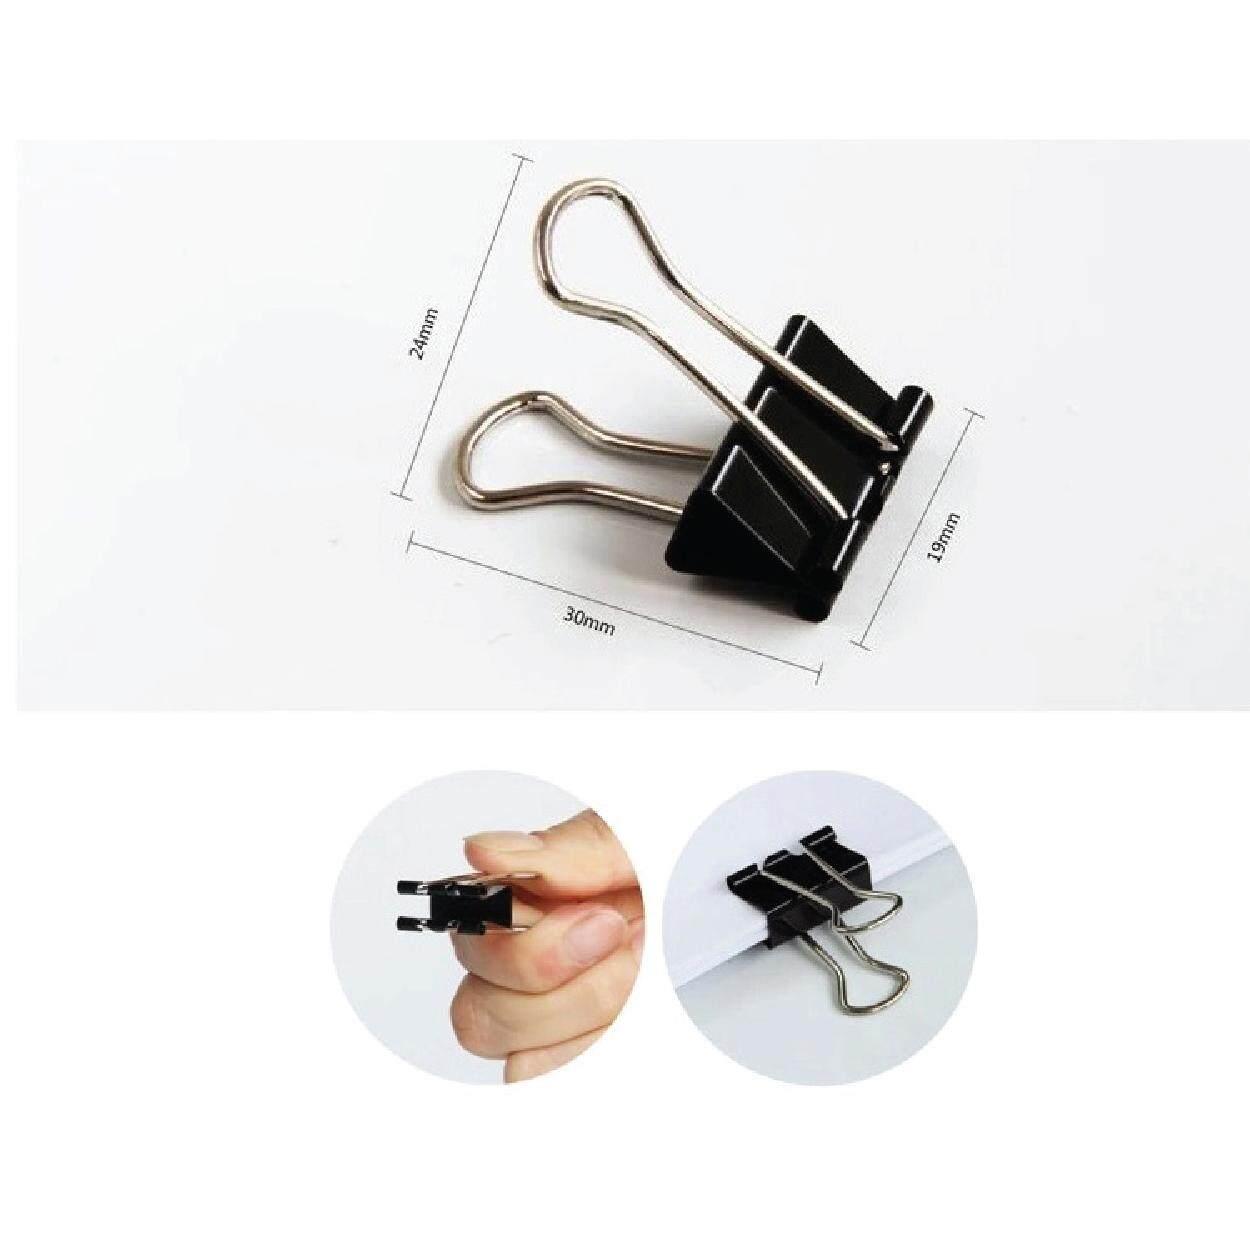 Binder Printing Abstract Black 20 Ring Crable Stationery Daftar Bantex Multiring Joger 25mm A5 Gemuk Kurus 1329 13 Source Detail Gambar Mini Paper Clips Metal Office School Documents Terbaru